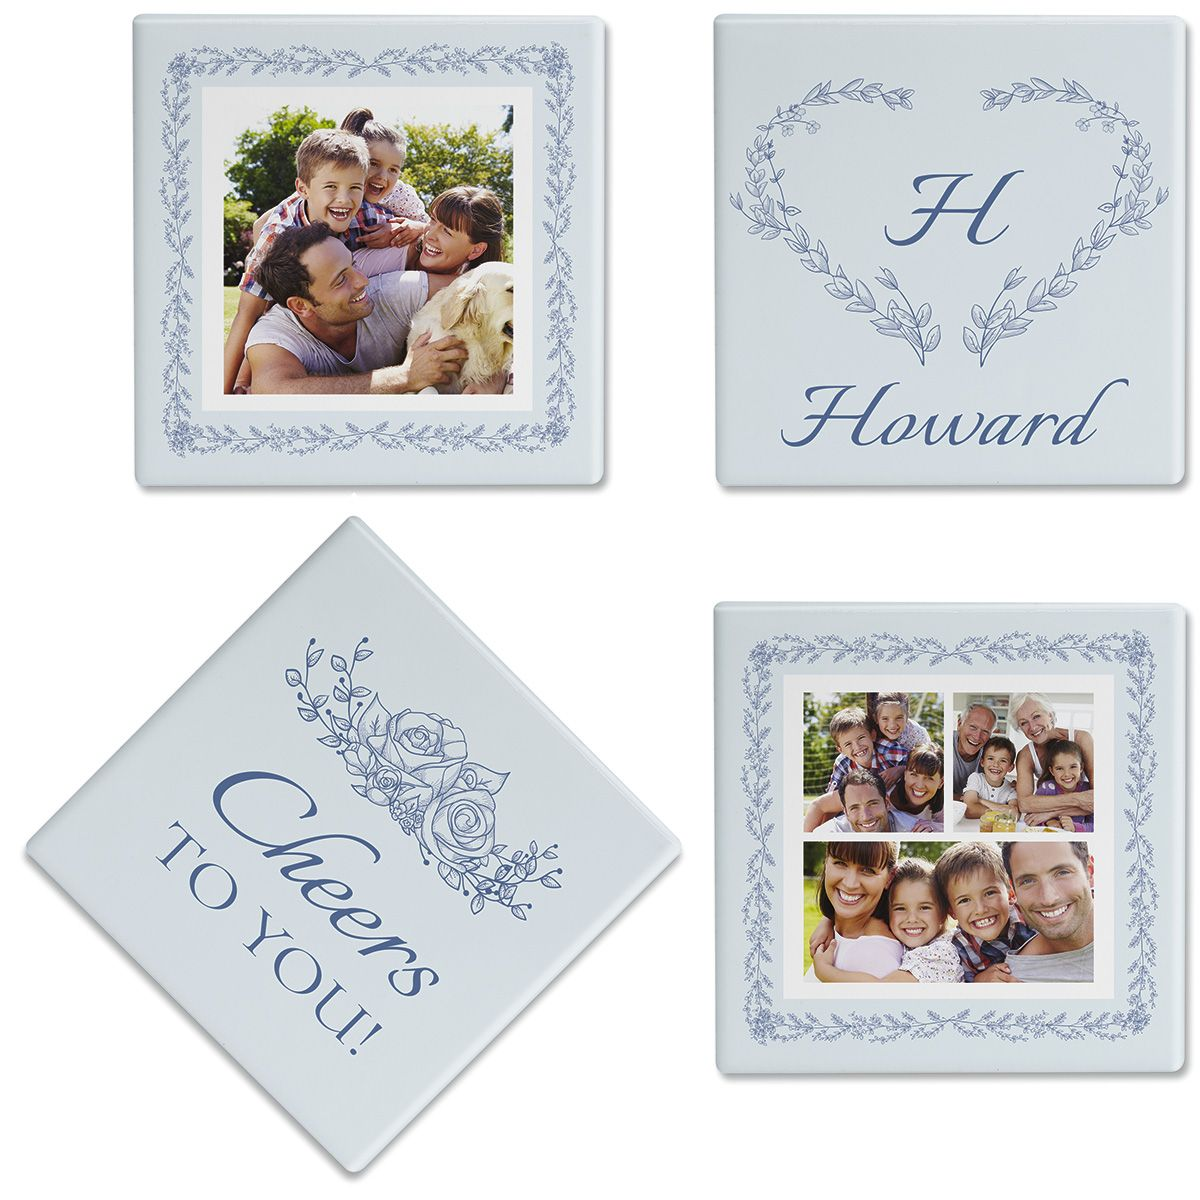 Laurel Cheers Photo Custom Coasters